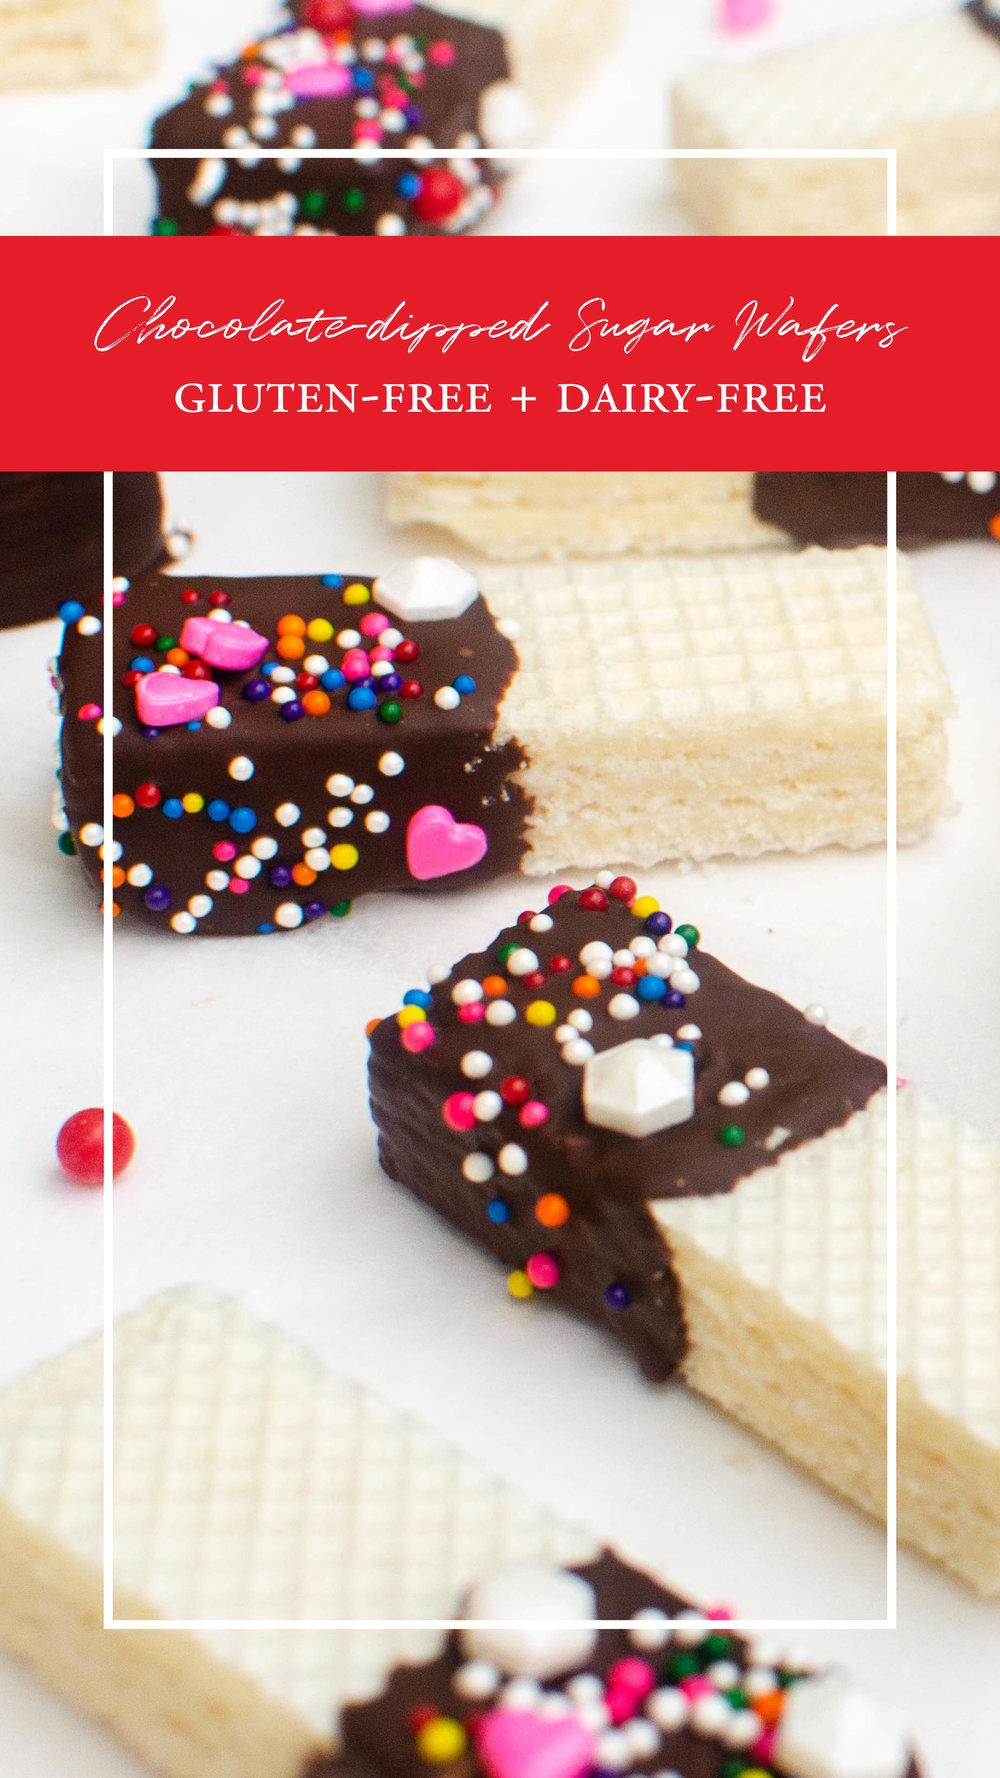 ChocolateDipped Sugar Wafers - Studioist4.jpg